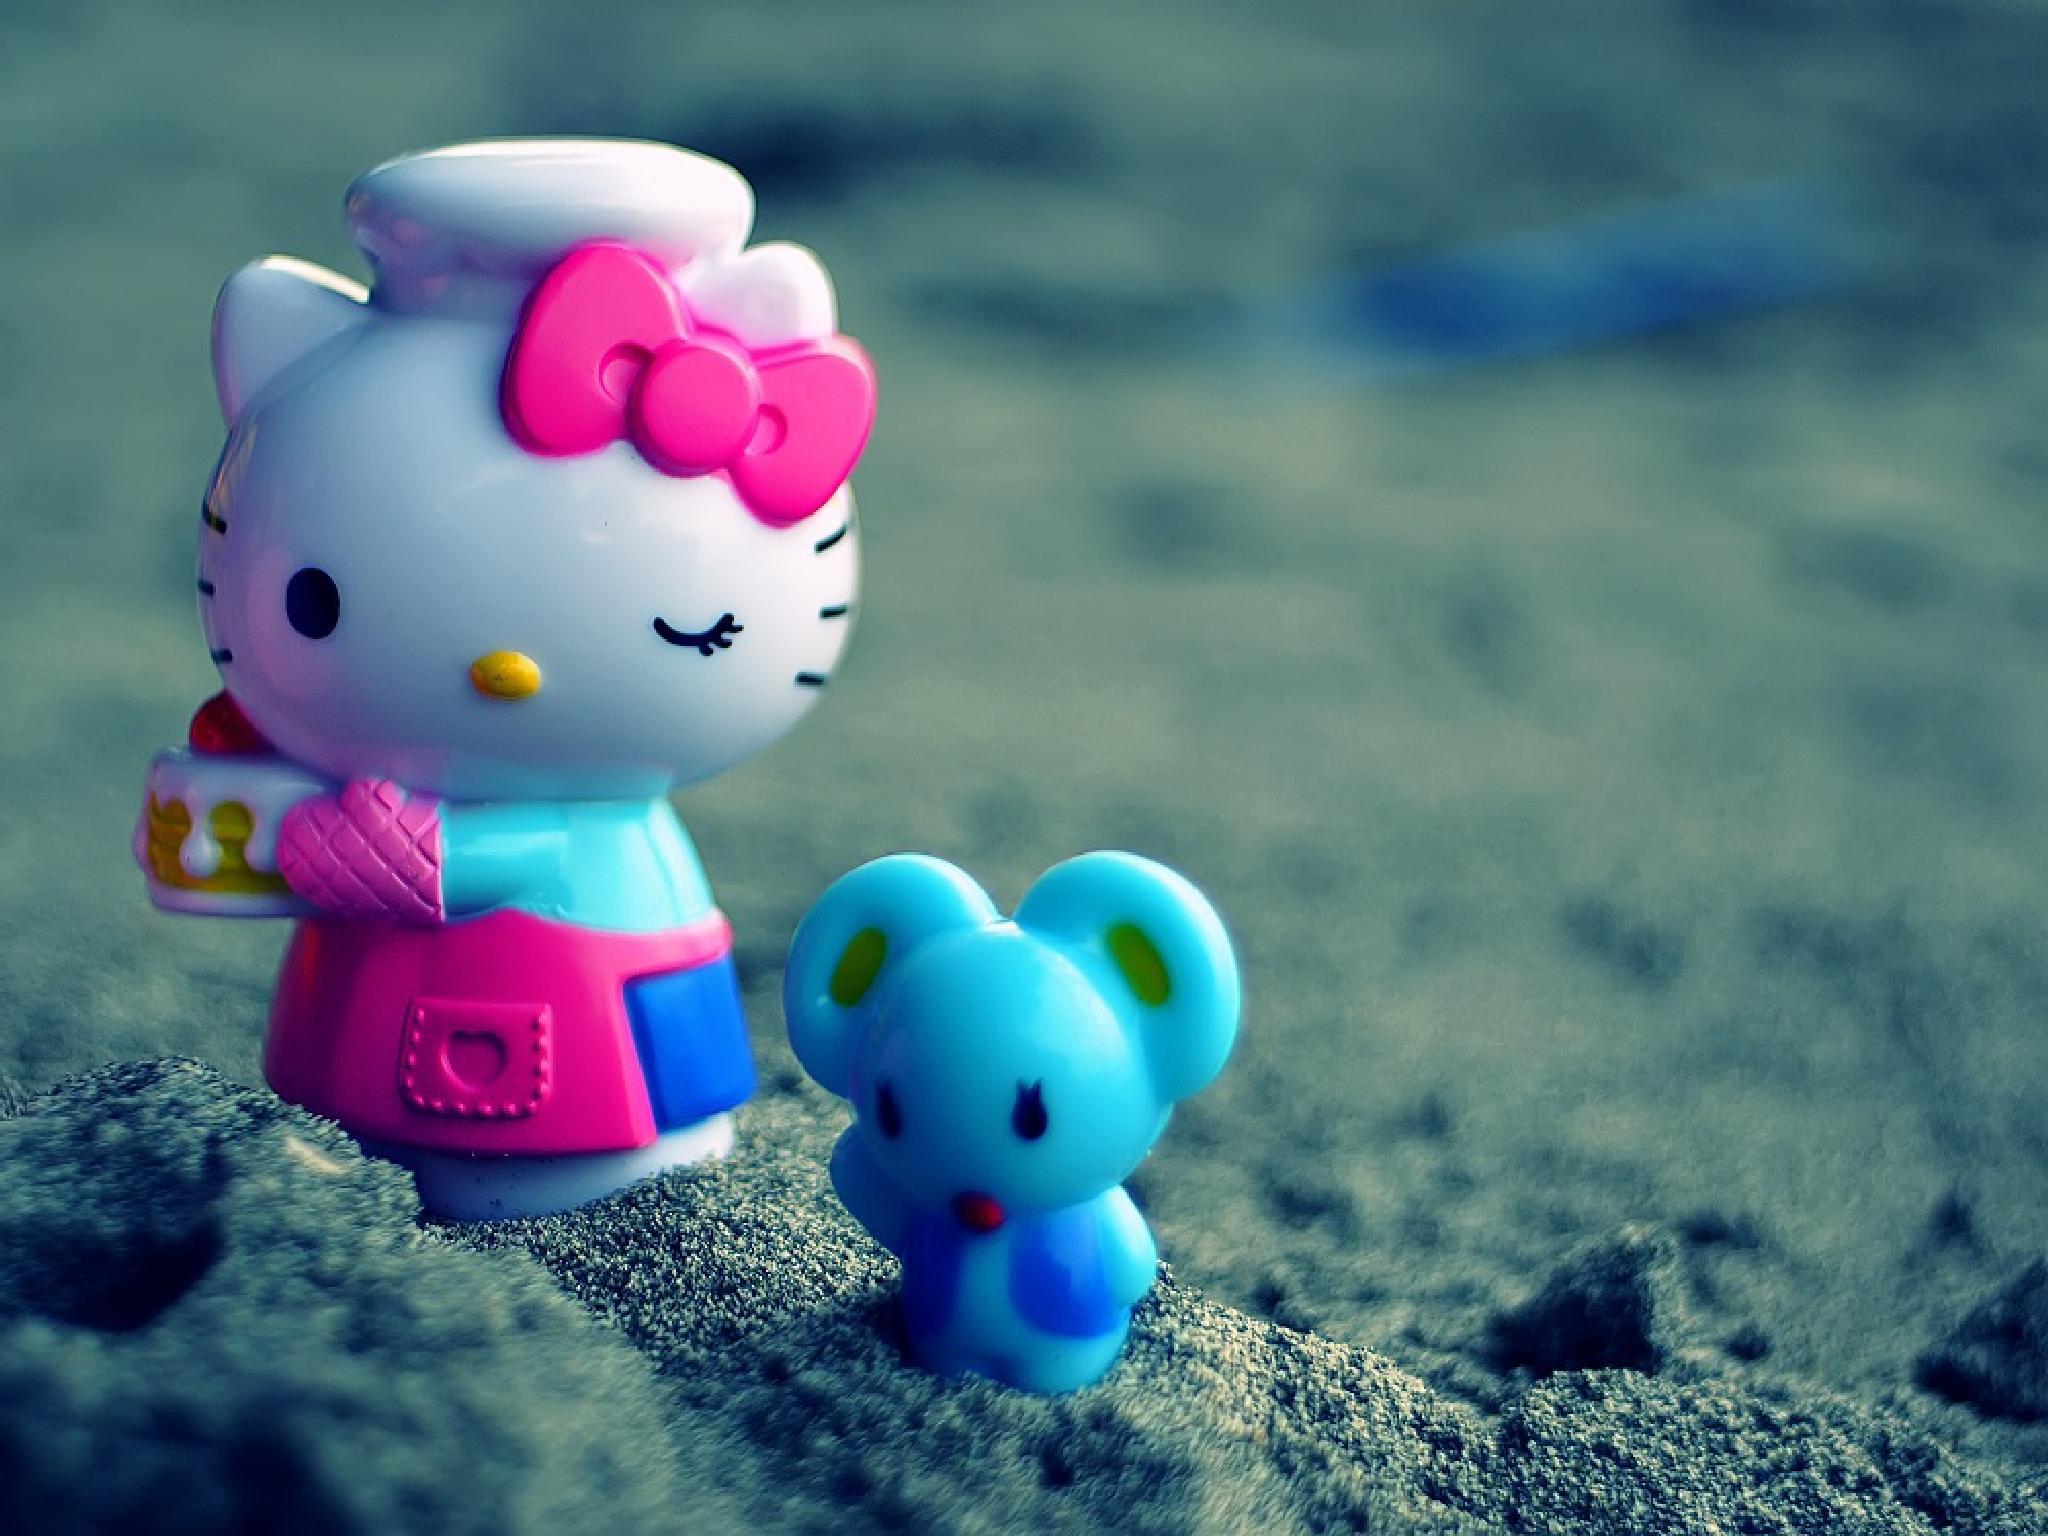 Little toy by hasandoel2